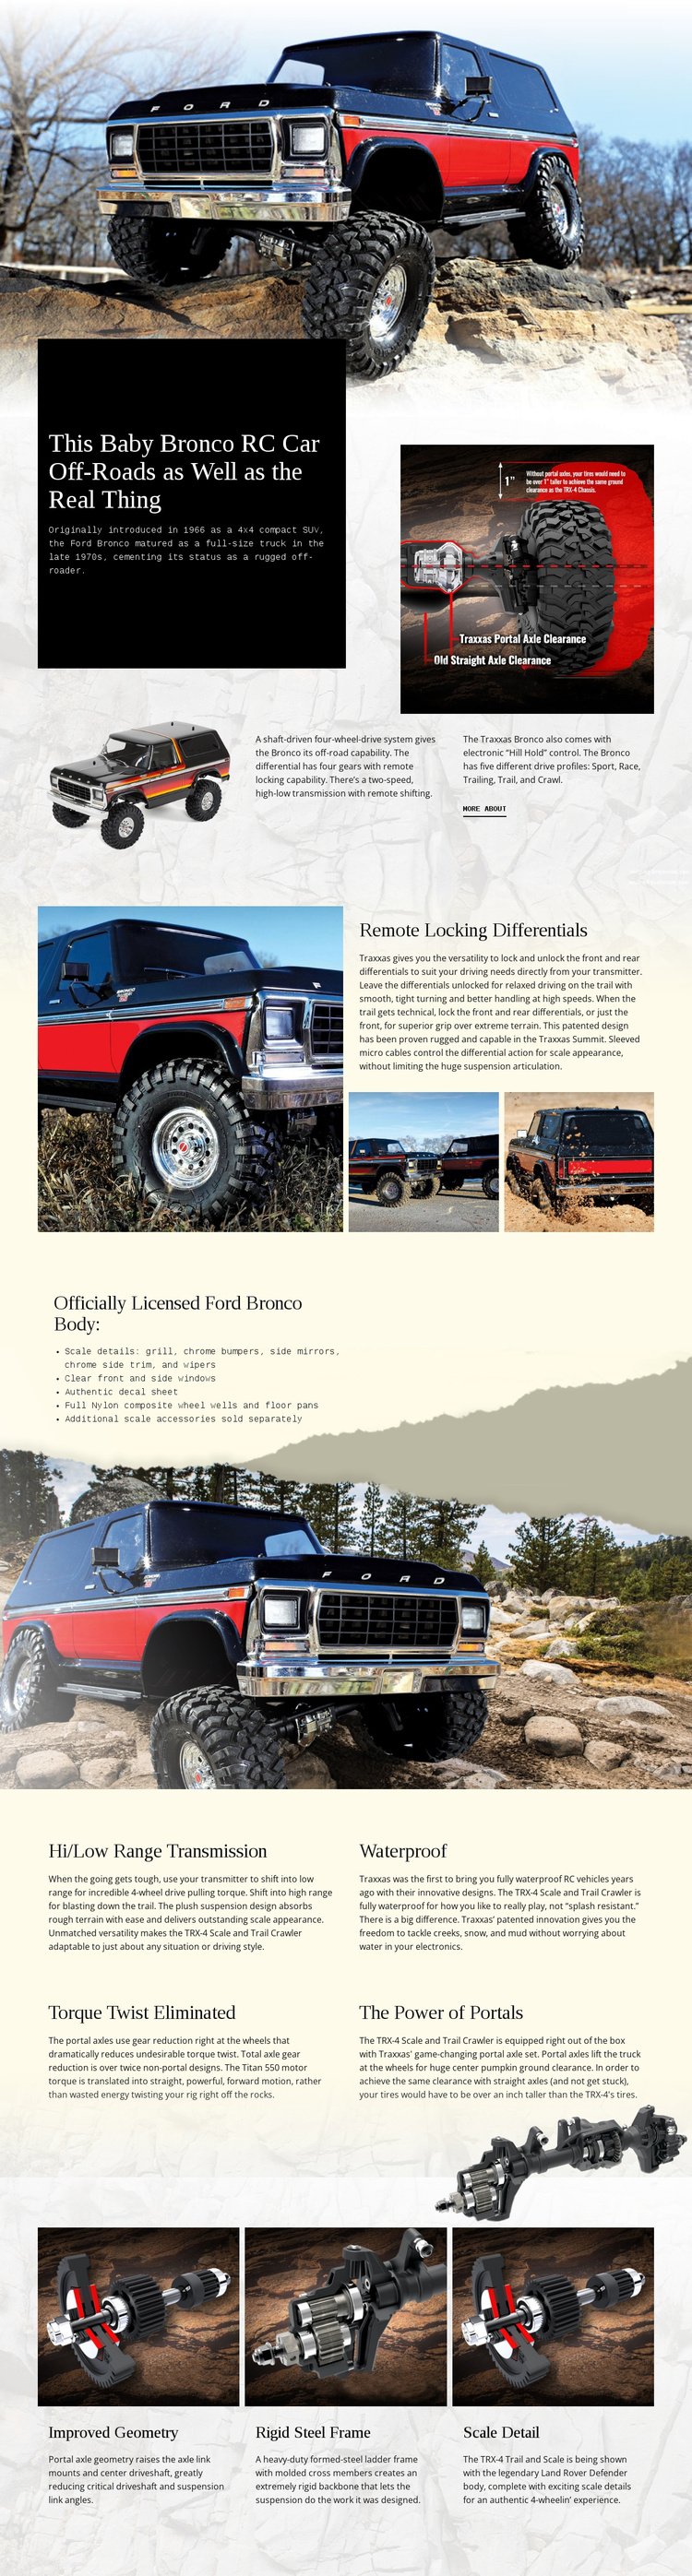 Bronco Rc Car Joomla Template